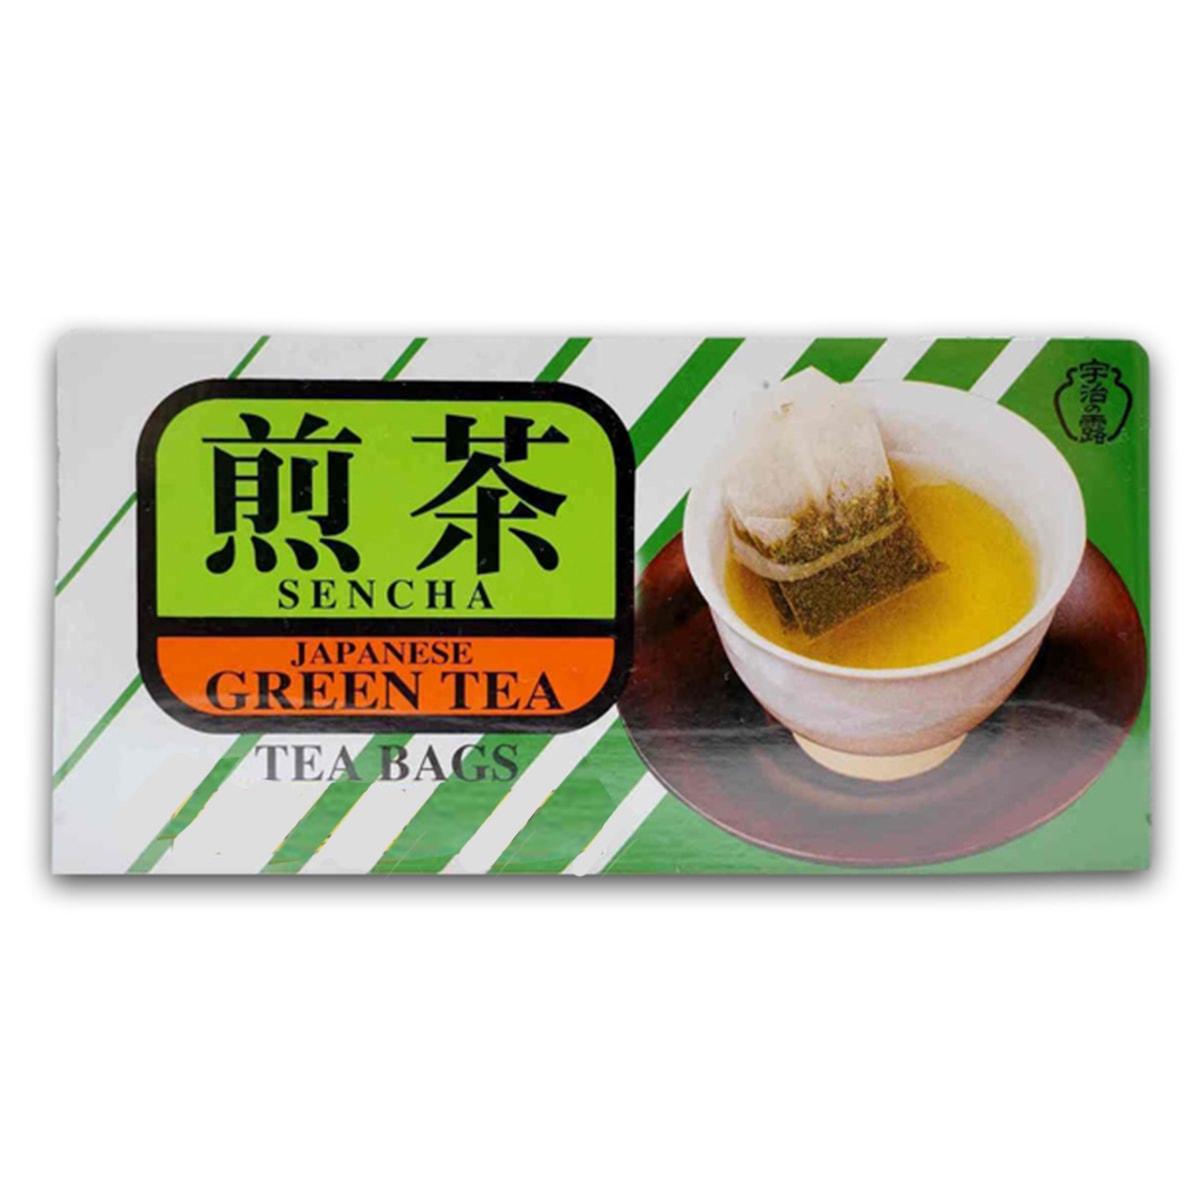 Buy Ujinotsuyu Japanese Green Tea (Sencha) (20 Teabags) - 40 gm